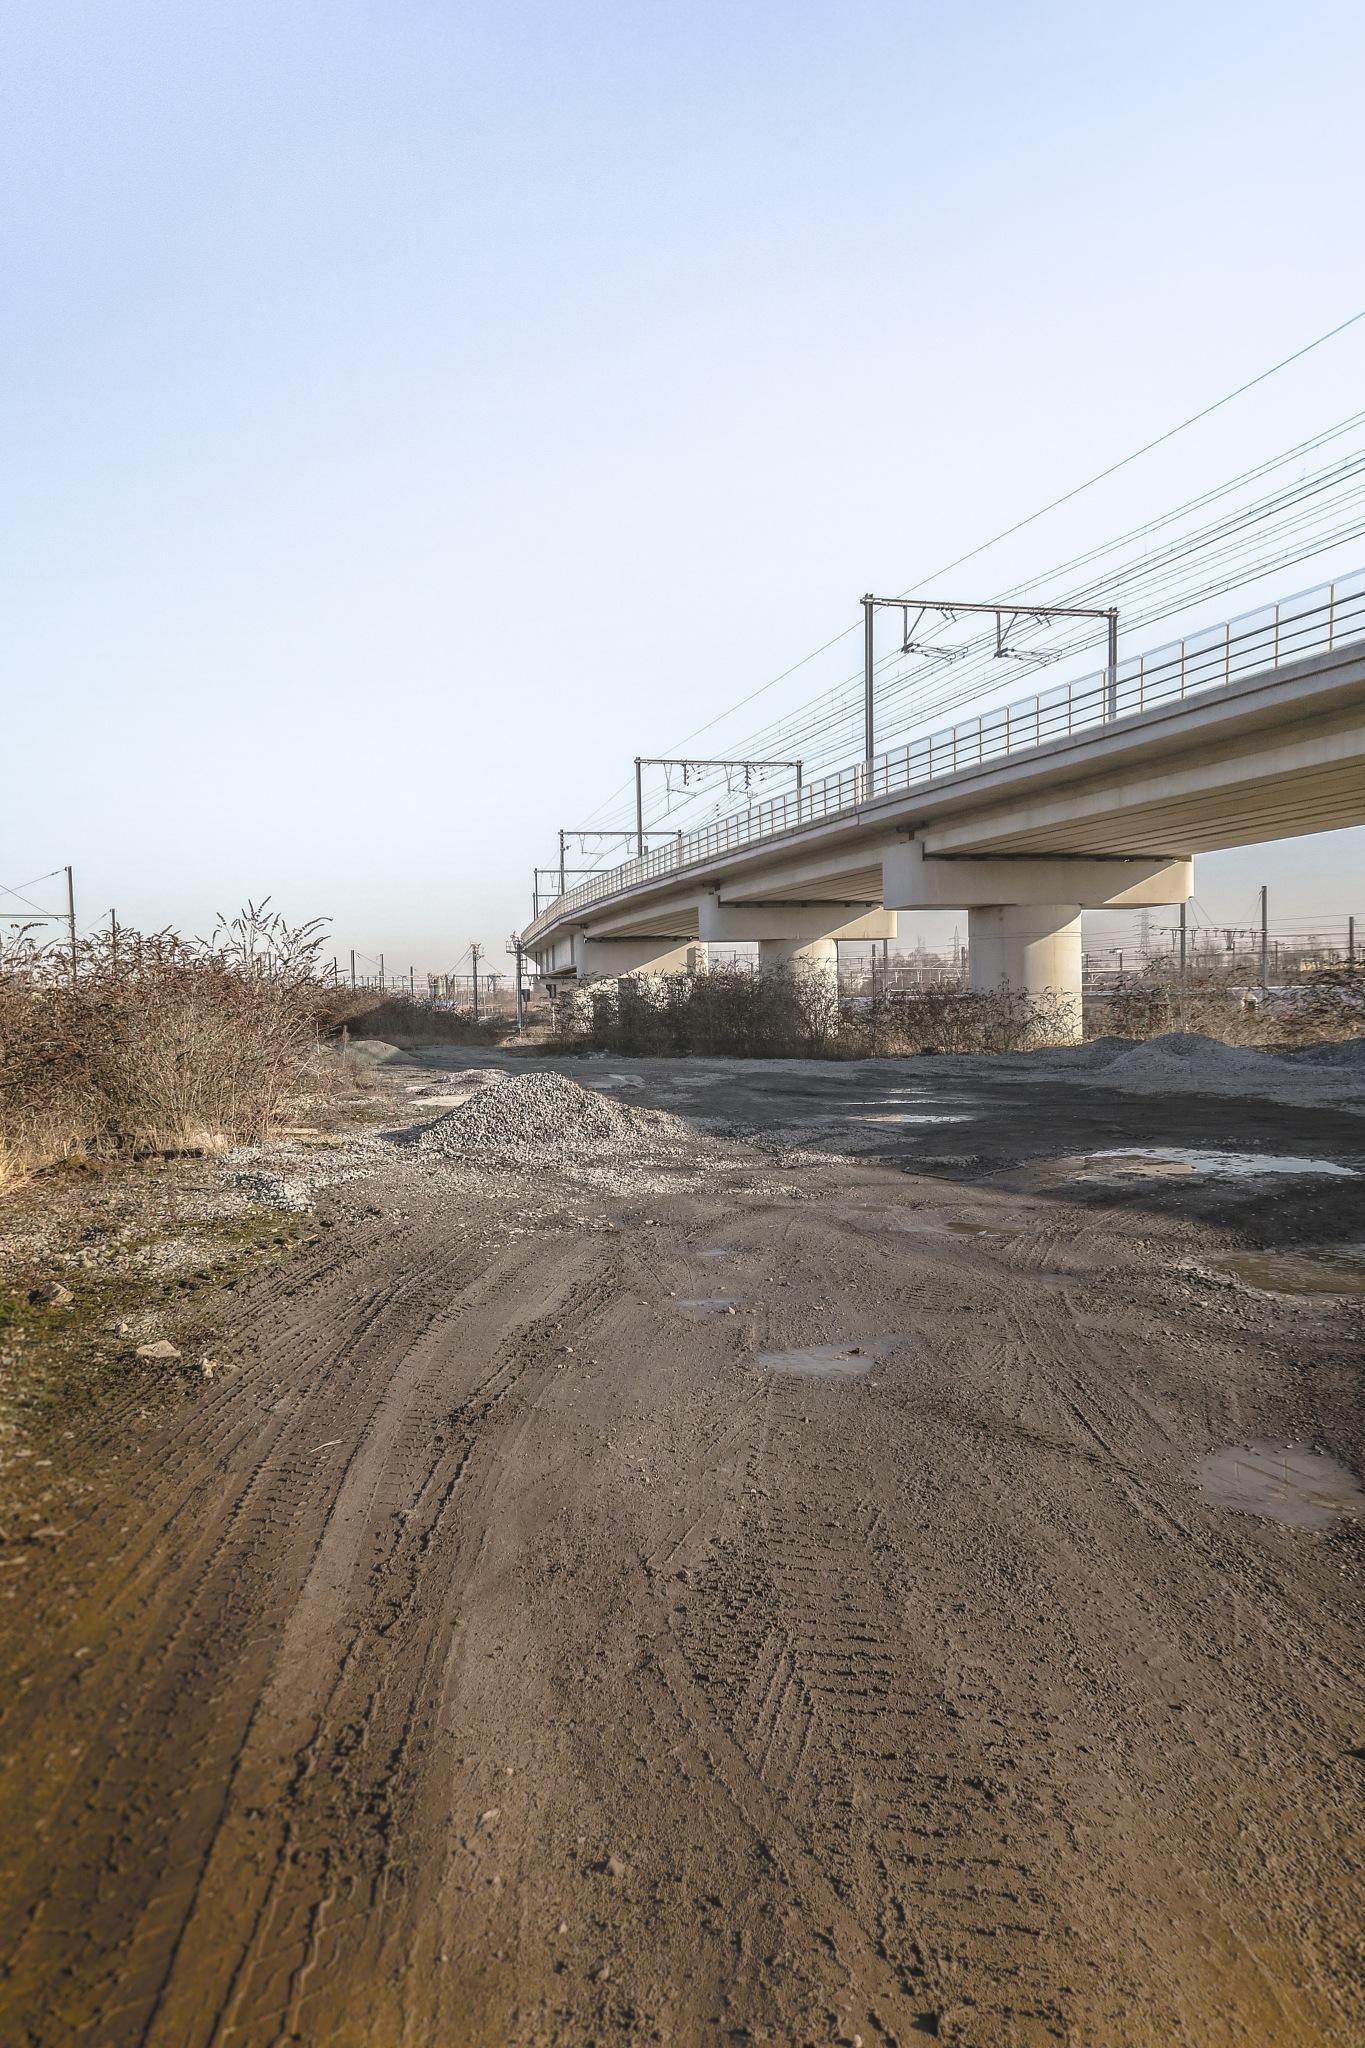 Under the bridge by Cedric Jover